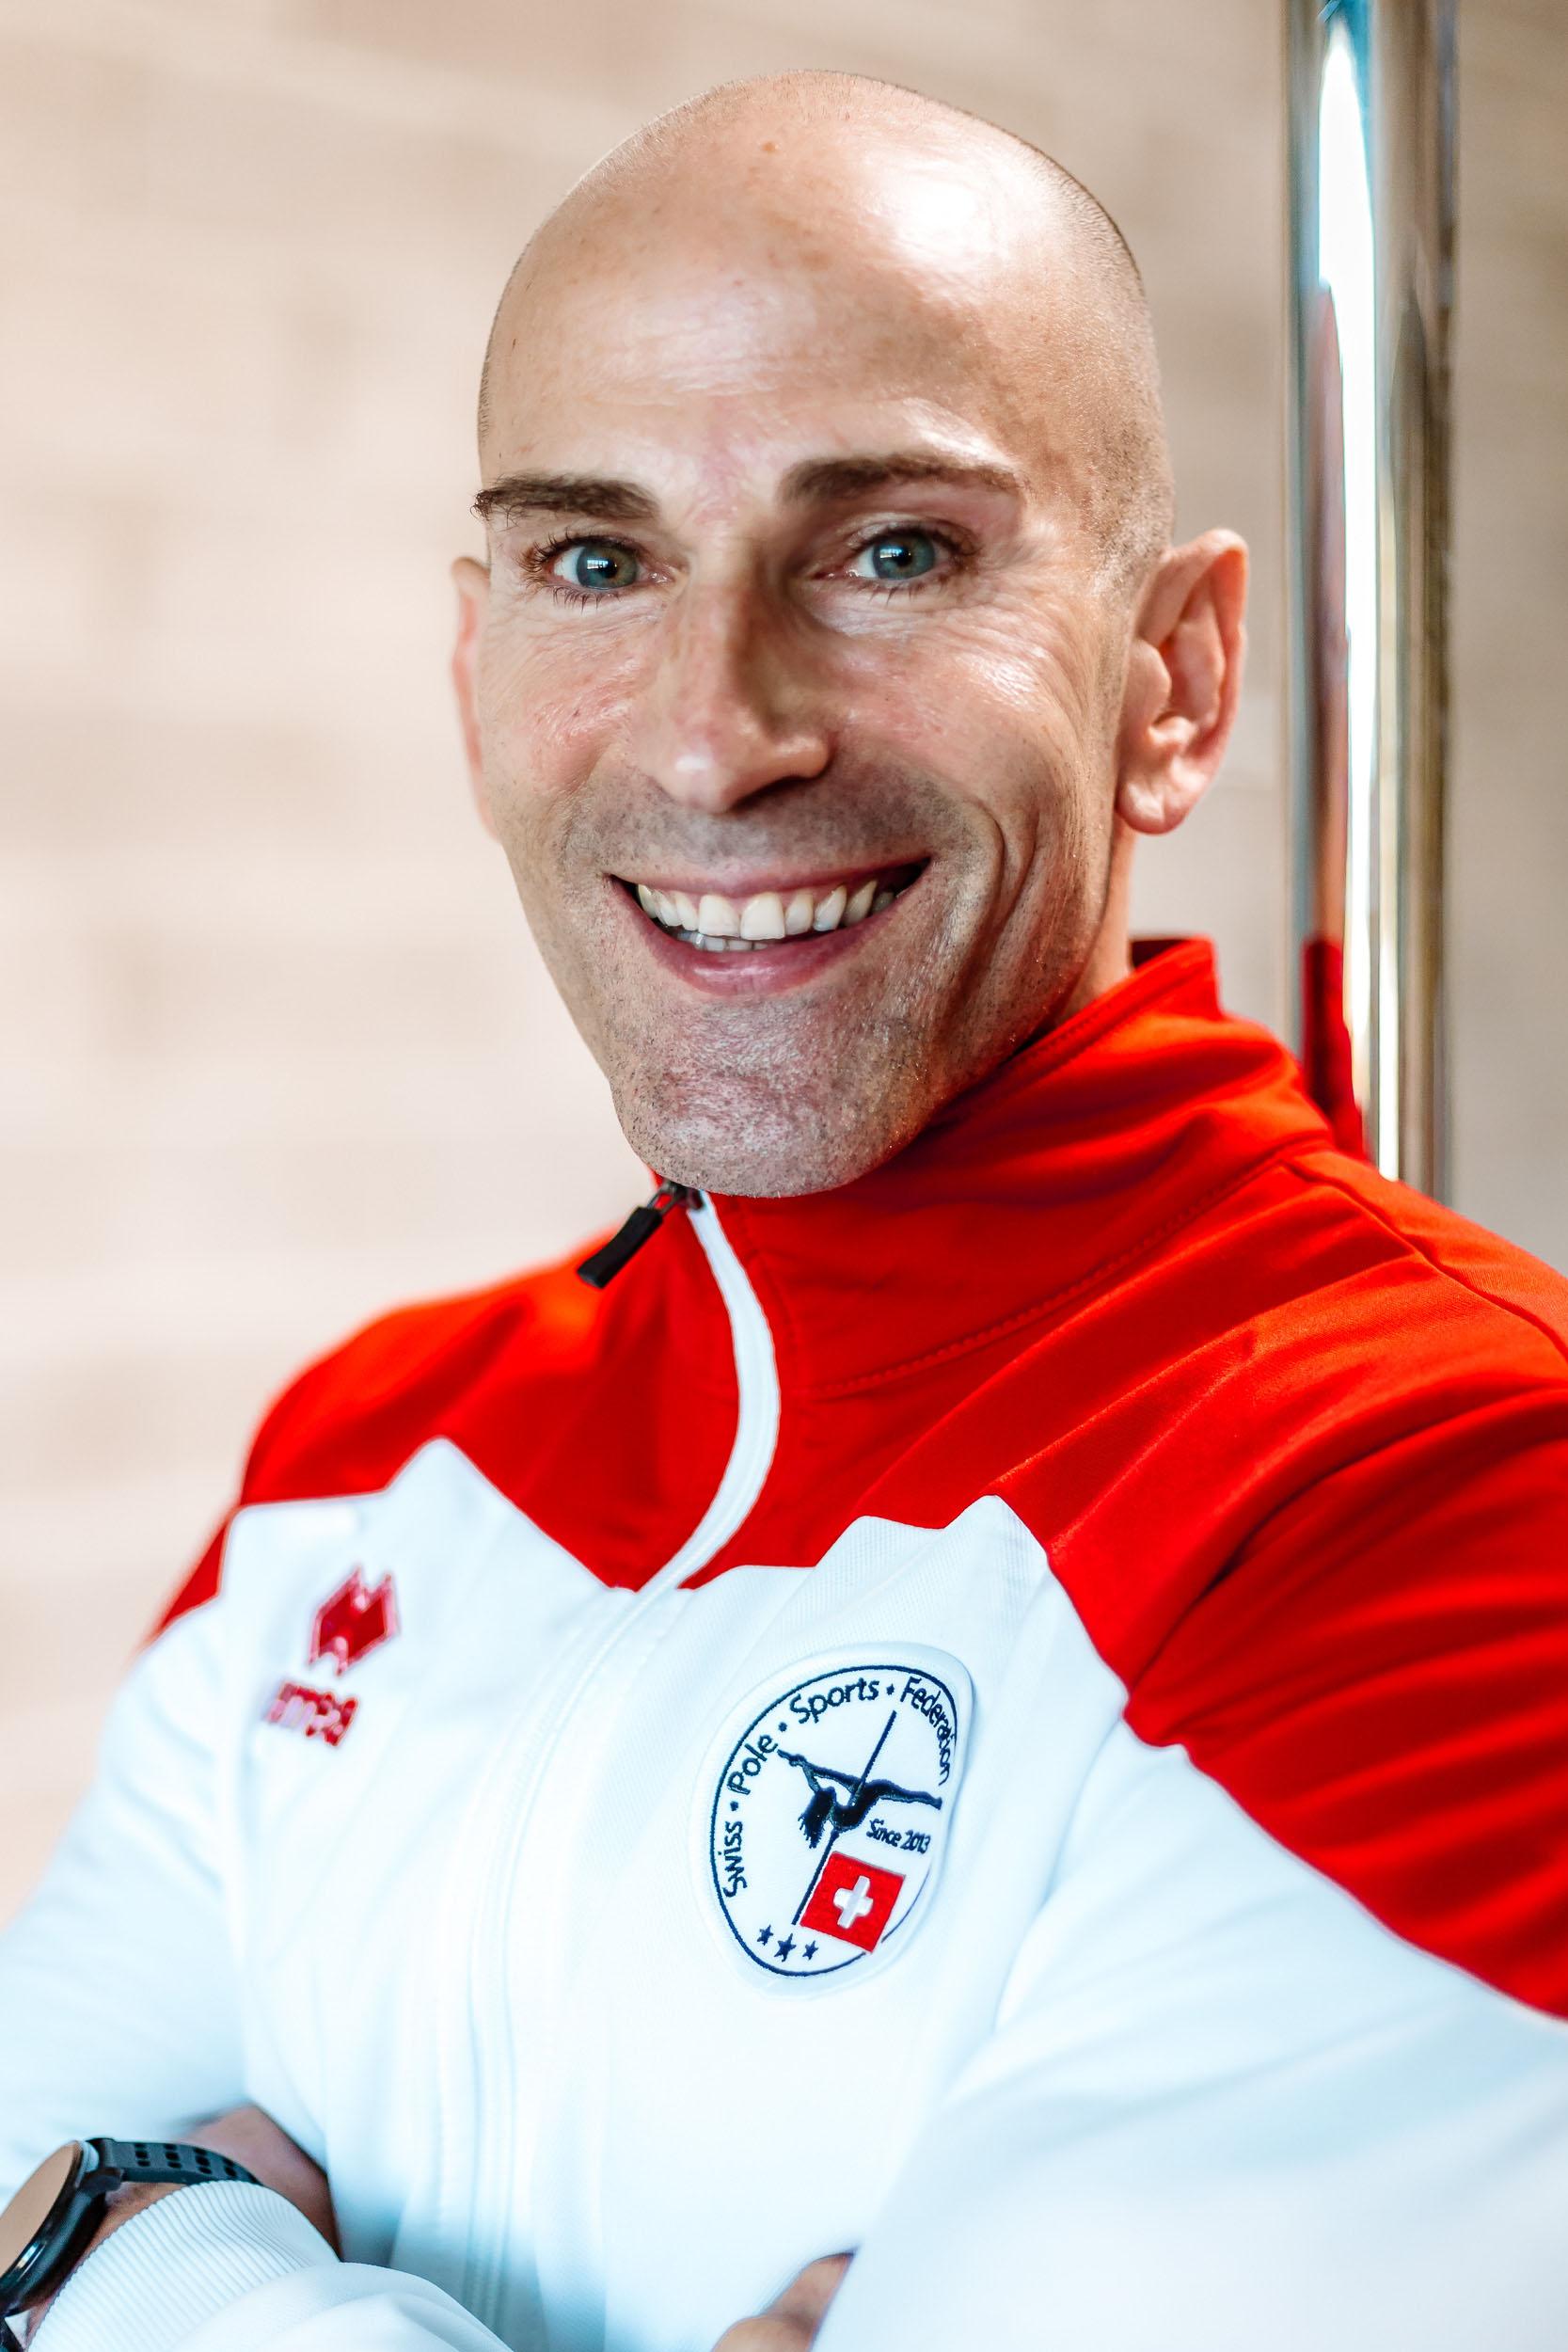 Benoît Imesch